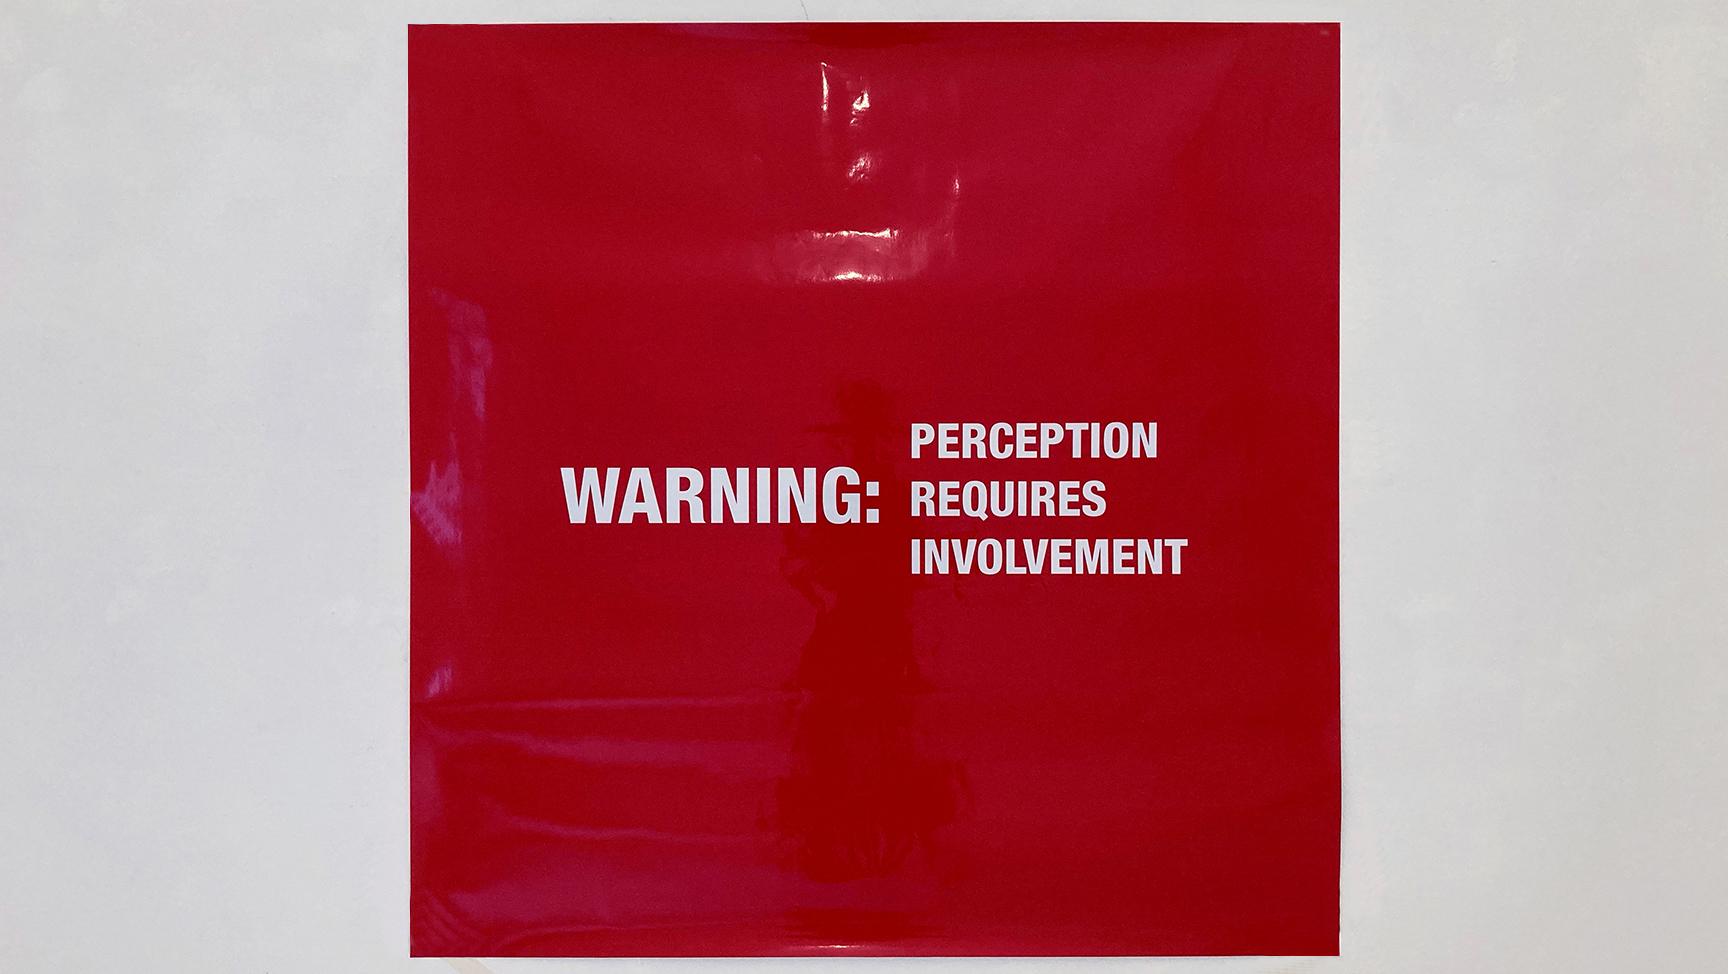 Antoni Muntadas, WARNING: PERCEPTION REQUIRES INVOLVEMENT, 2002